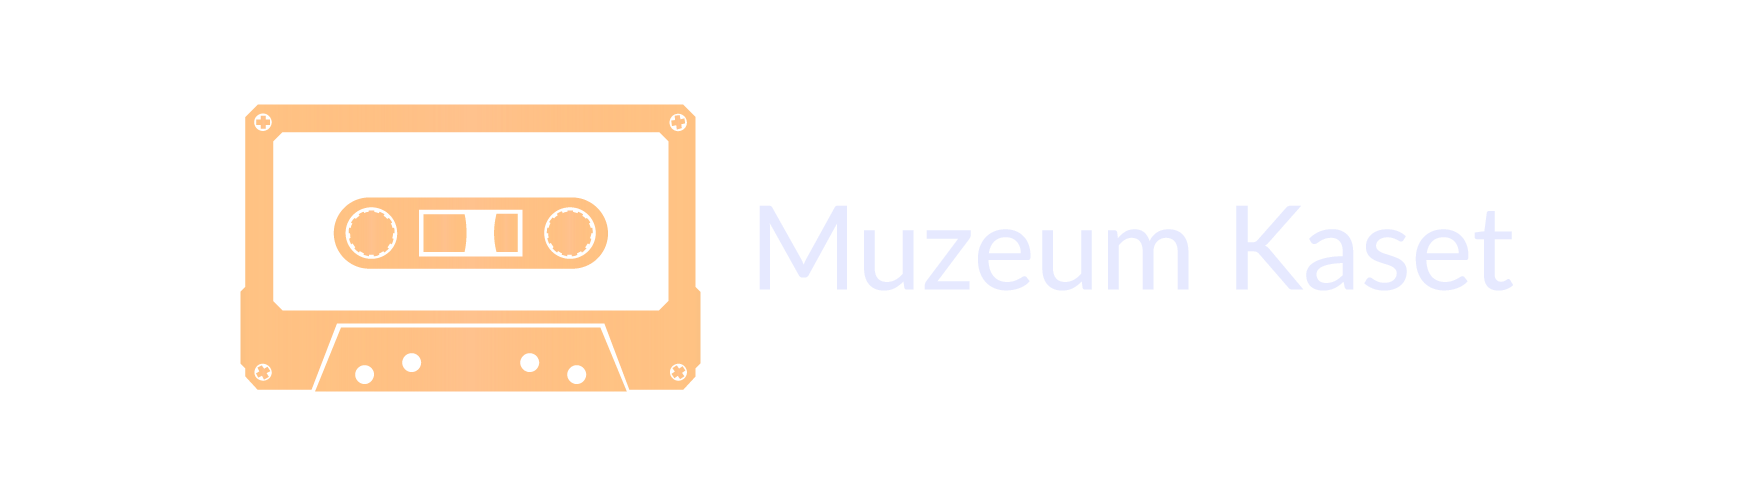 Muzuem Kaset